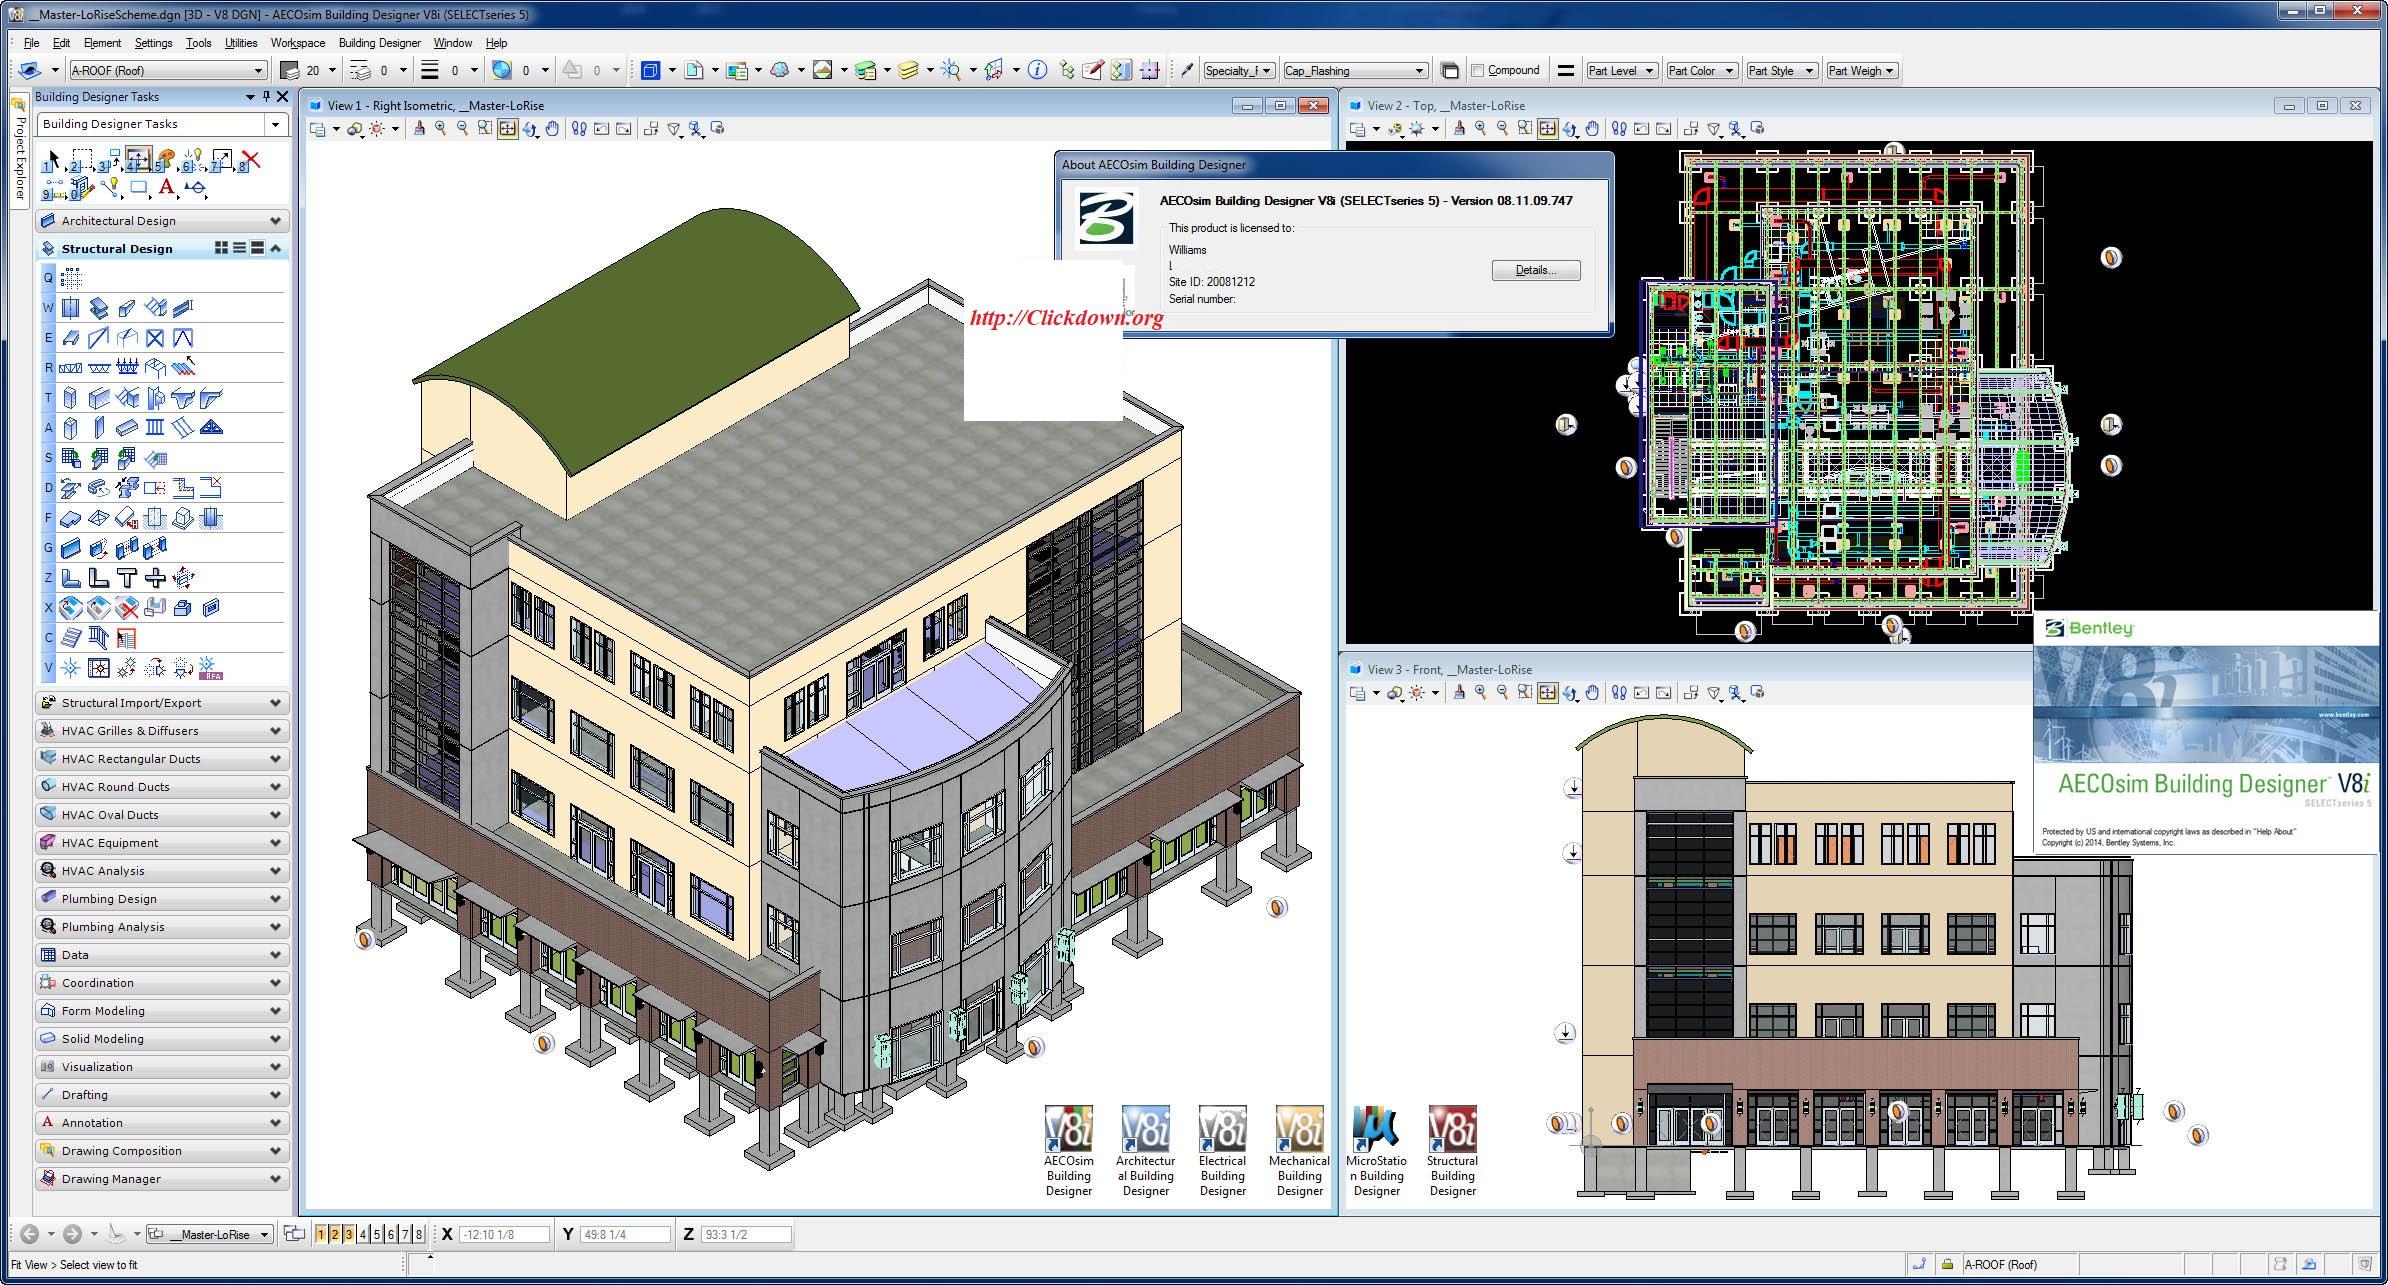 Working with Bentley AECOsim Building Designer V8i.SS5 08.11.09.747 full